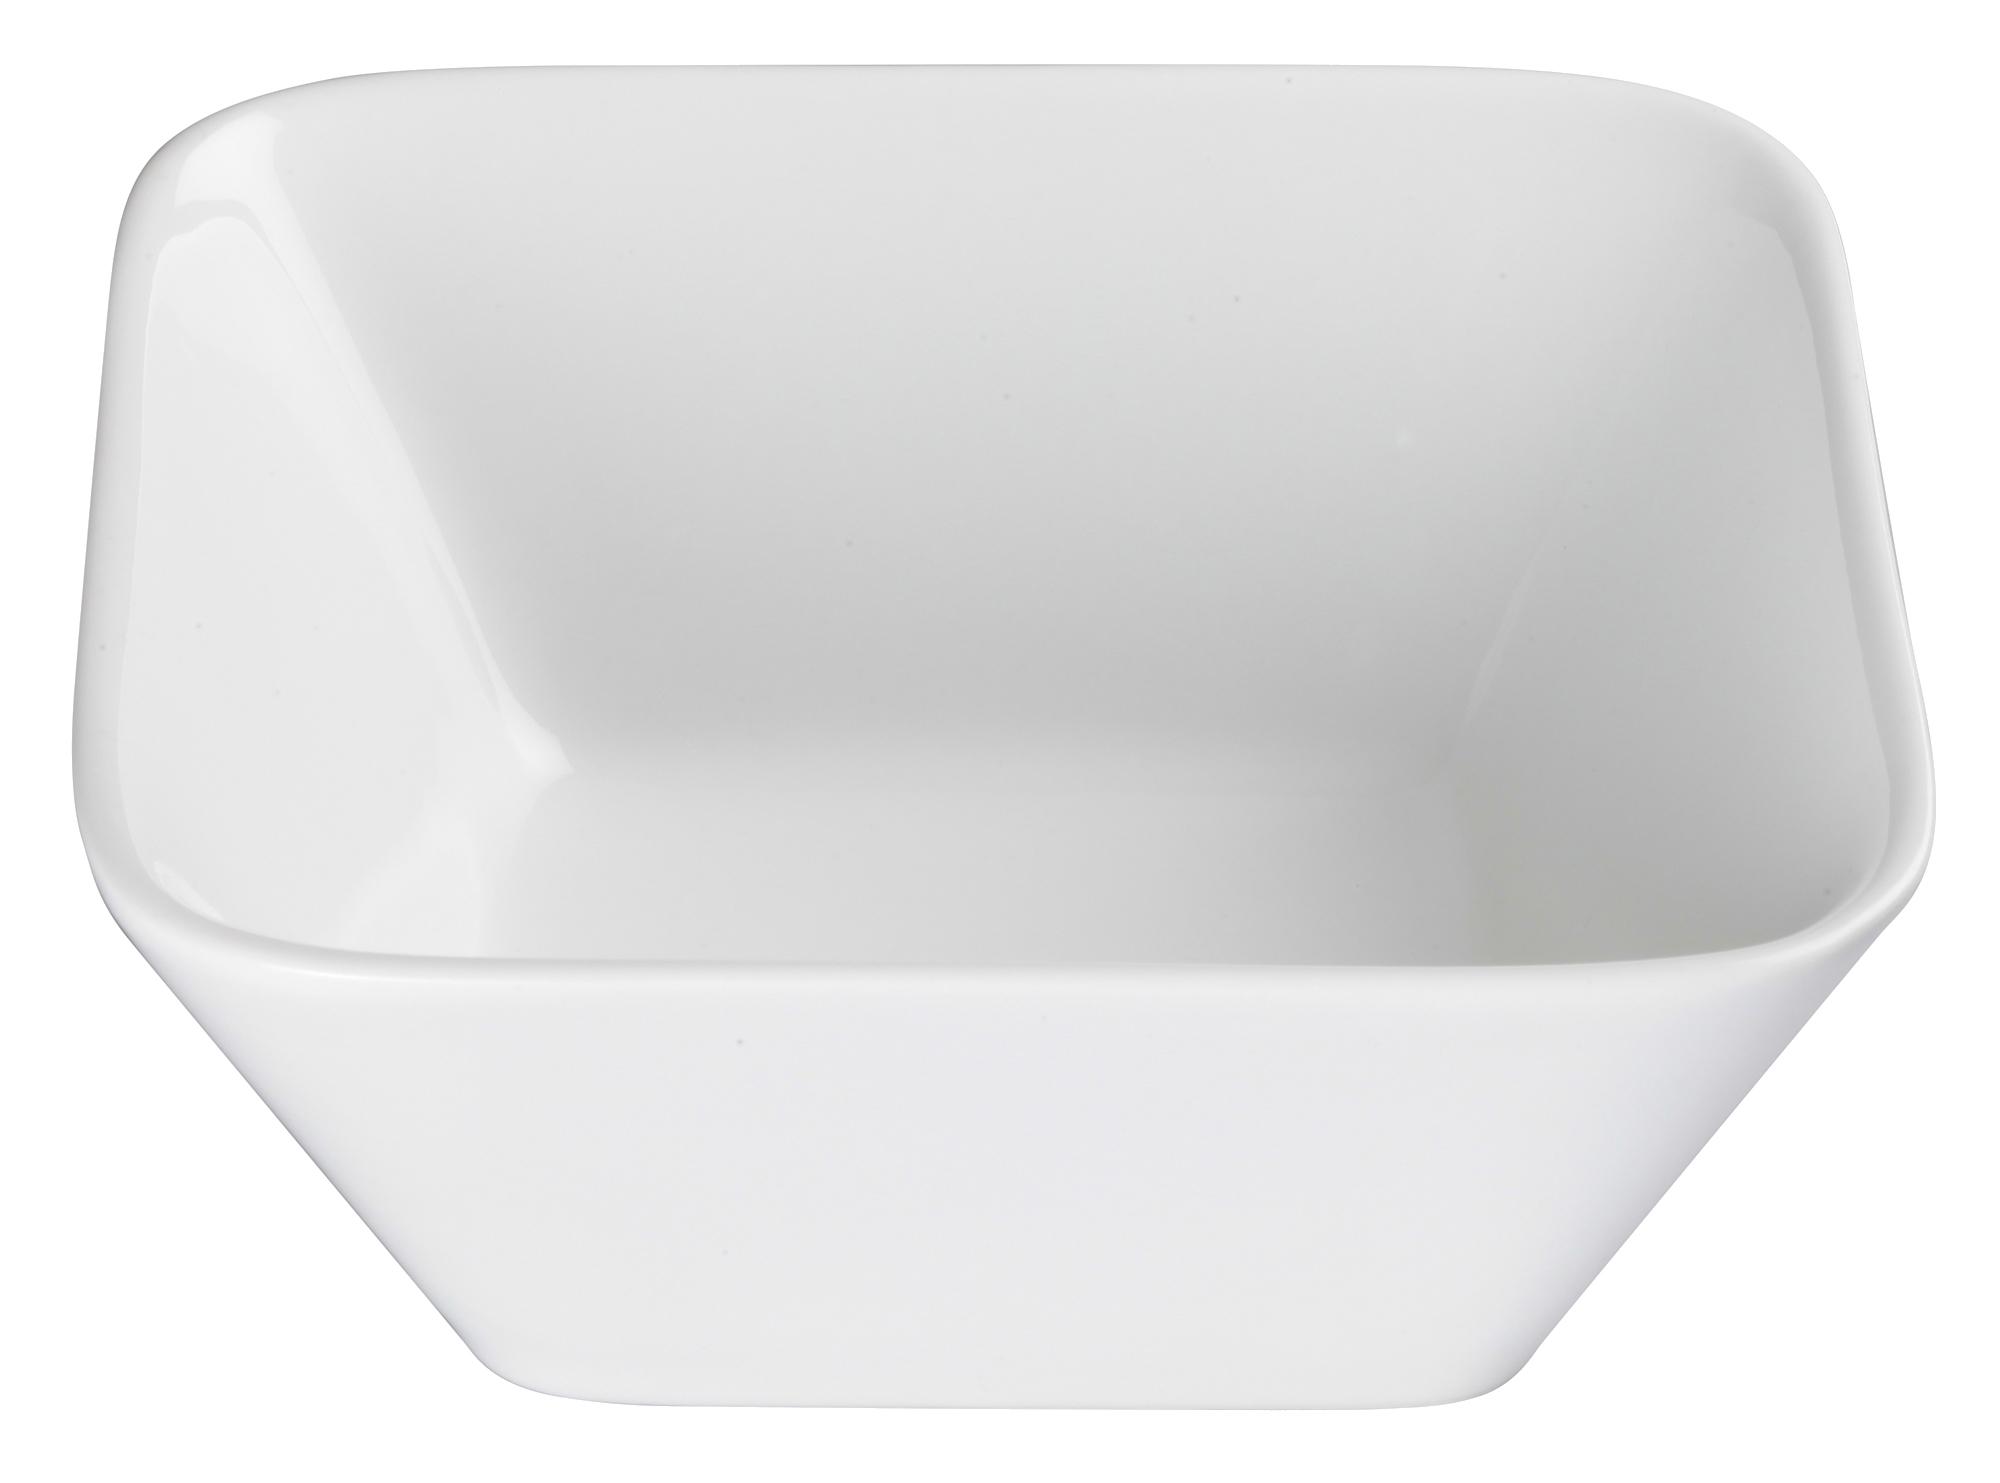 Winco WDP008-103 china, bowl, 17 - 32 oz